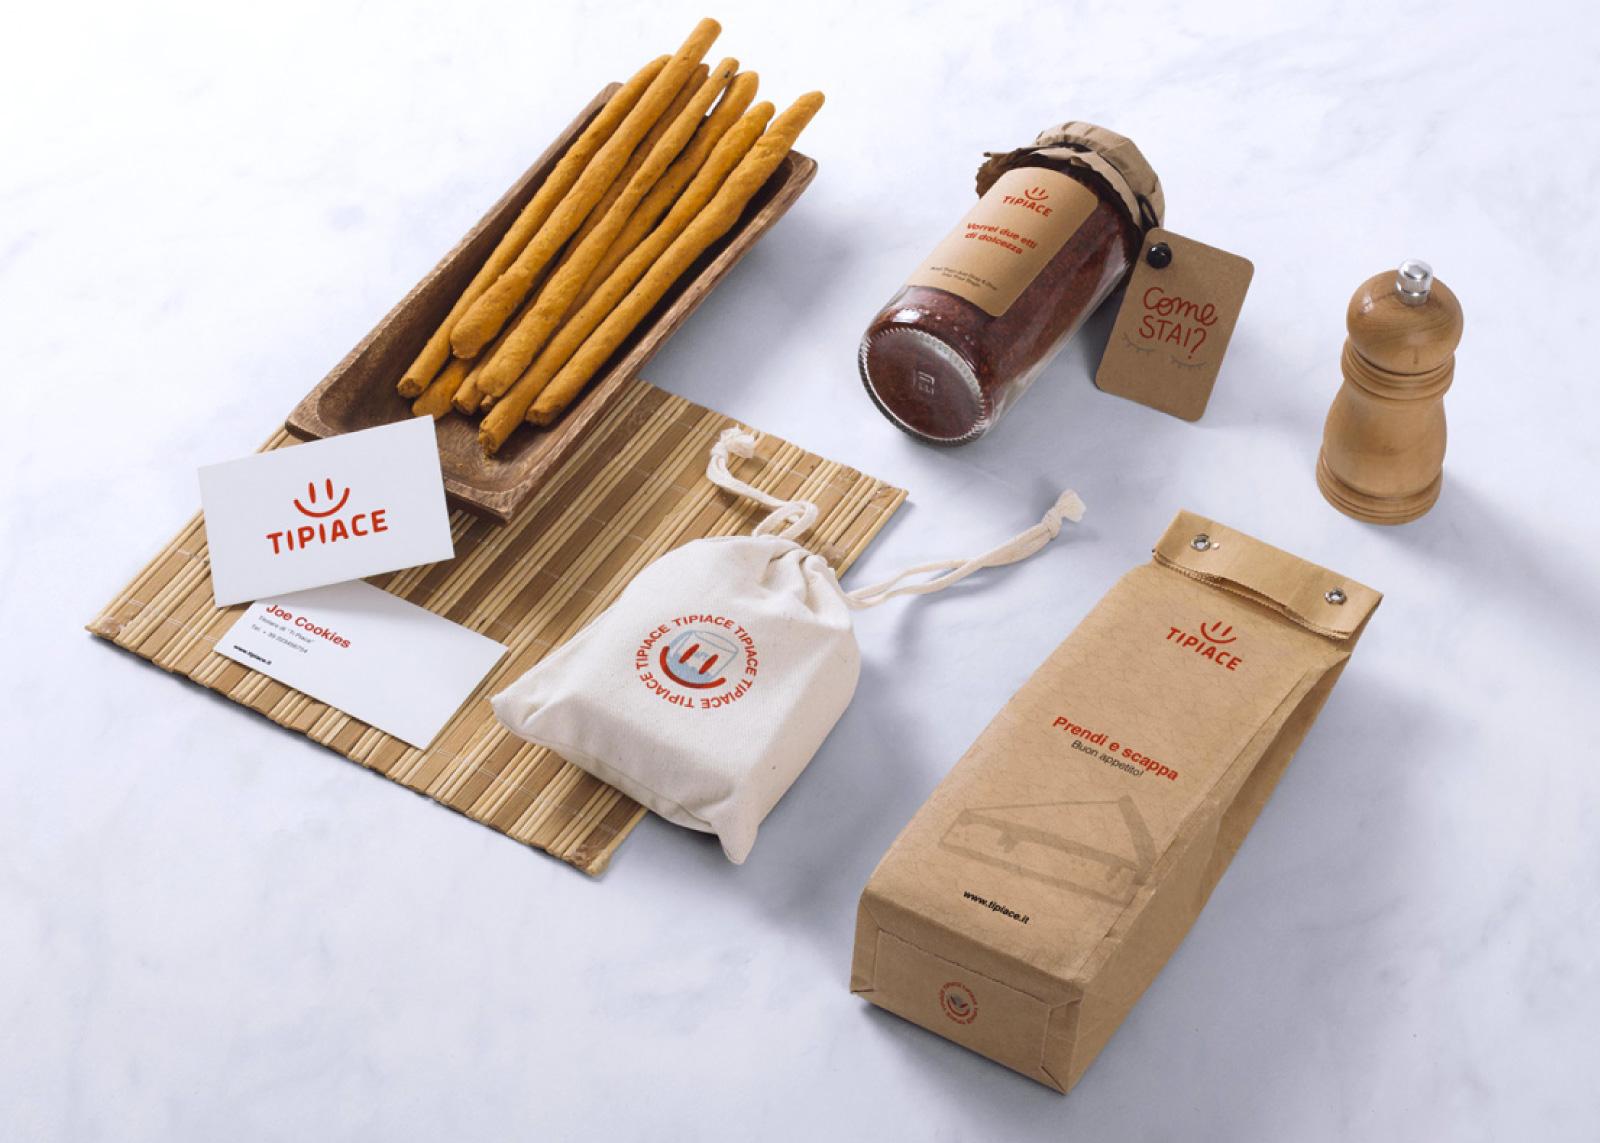 tipiace_packaging-pasticceria-caffetteria-milano-branding